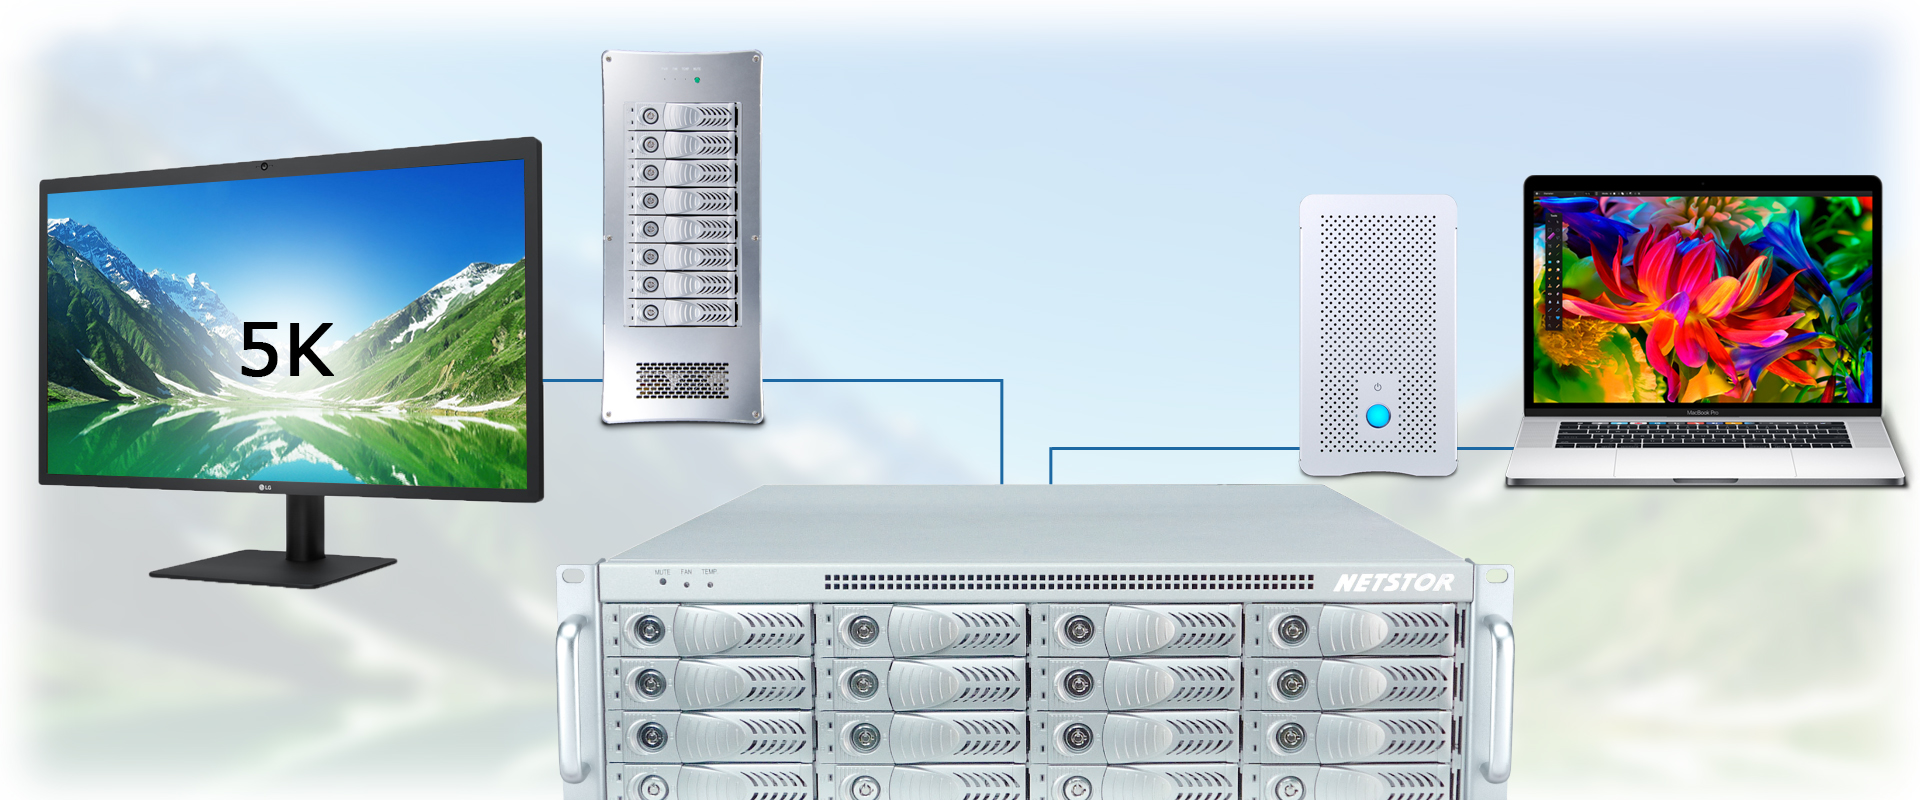 Thunderbolt 3 devices daisy-chain with NA333TB3